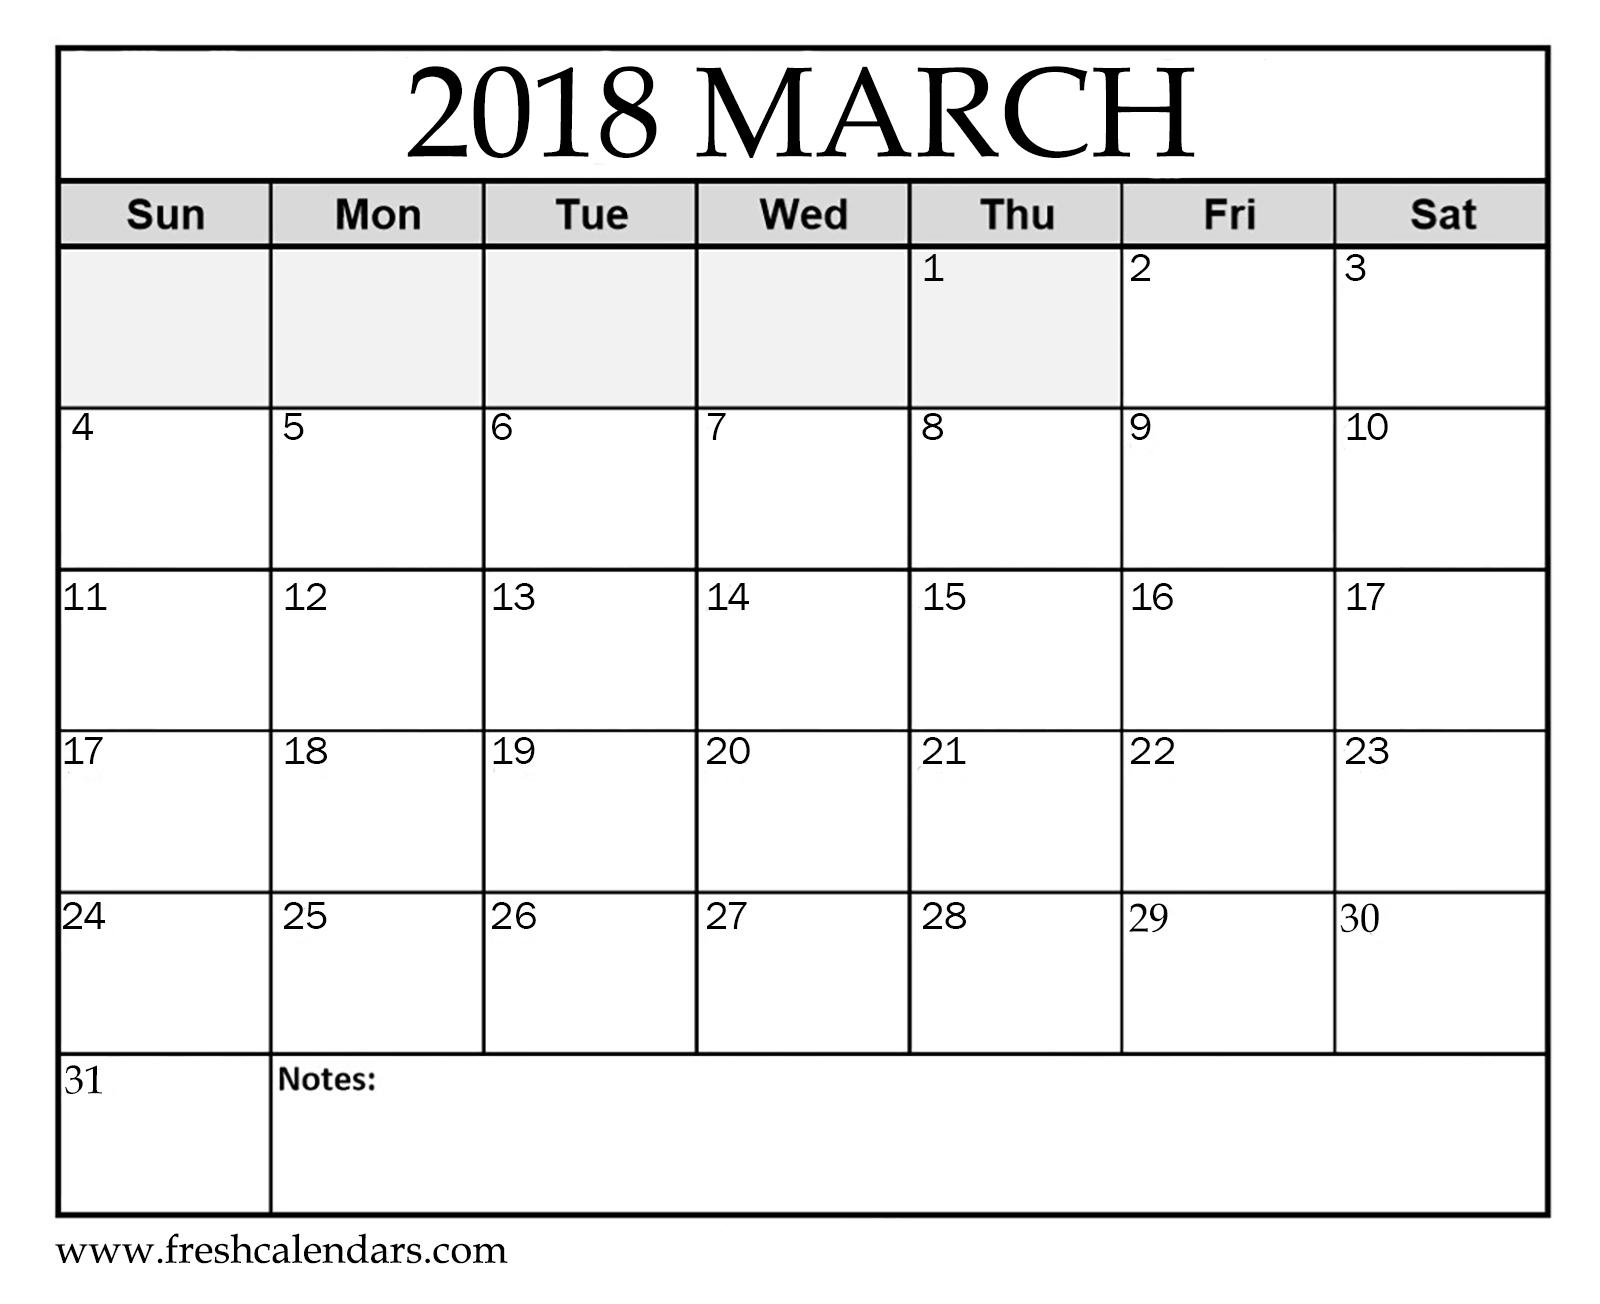 Free Printable Calendar Templates No Download - Basuh